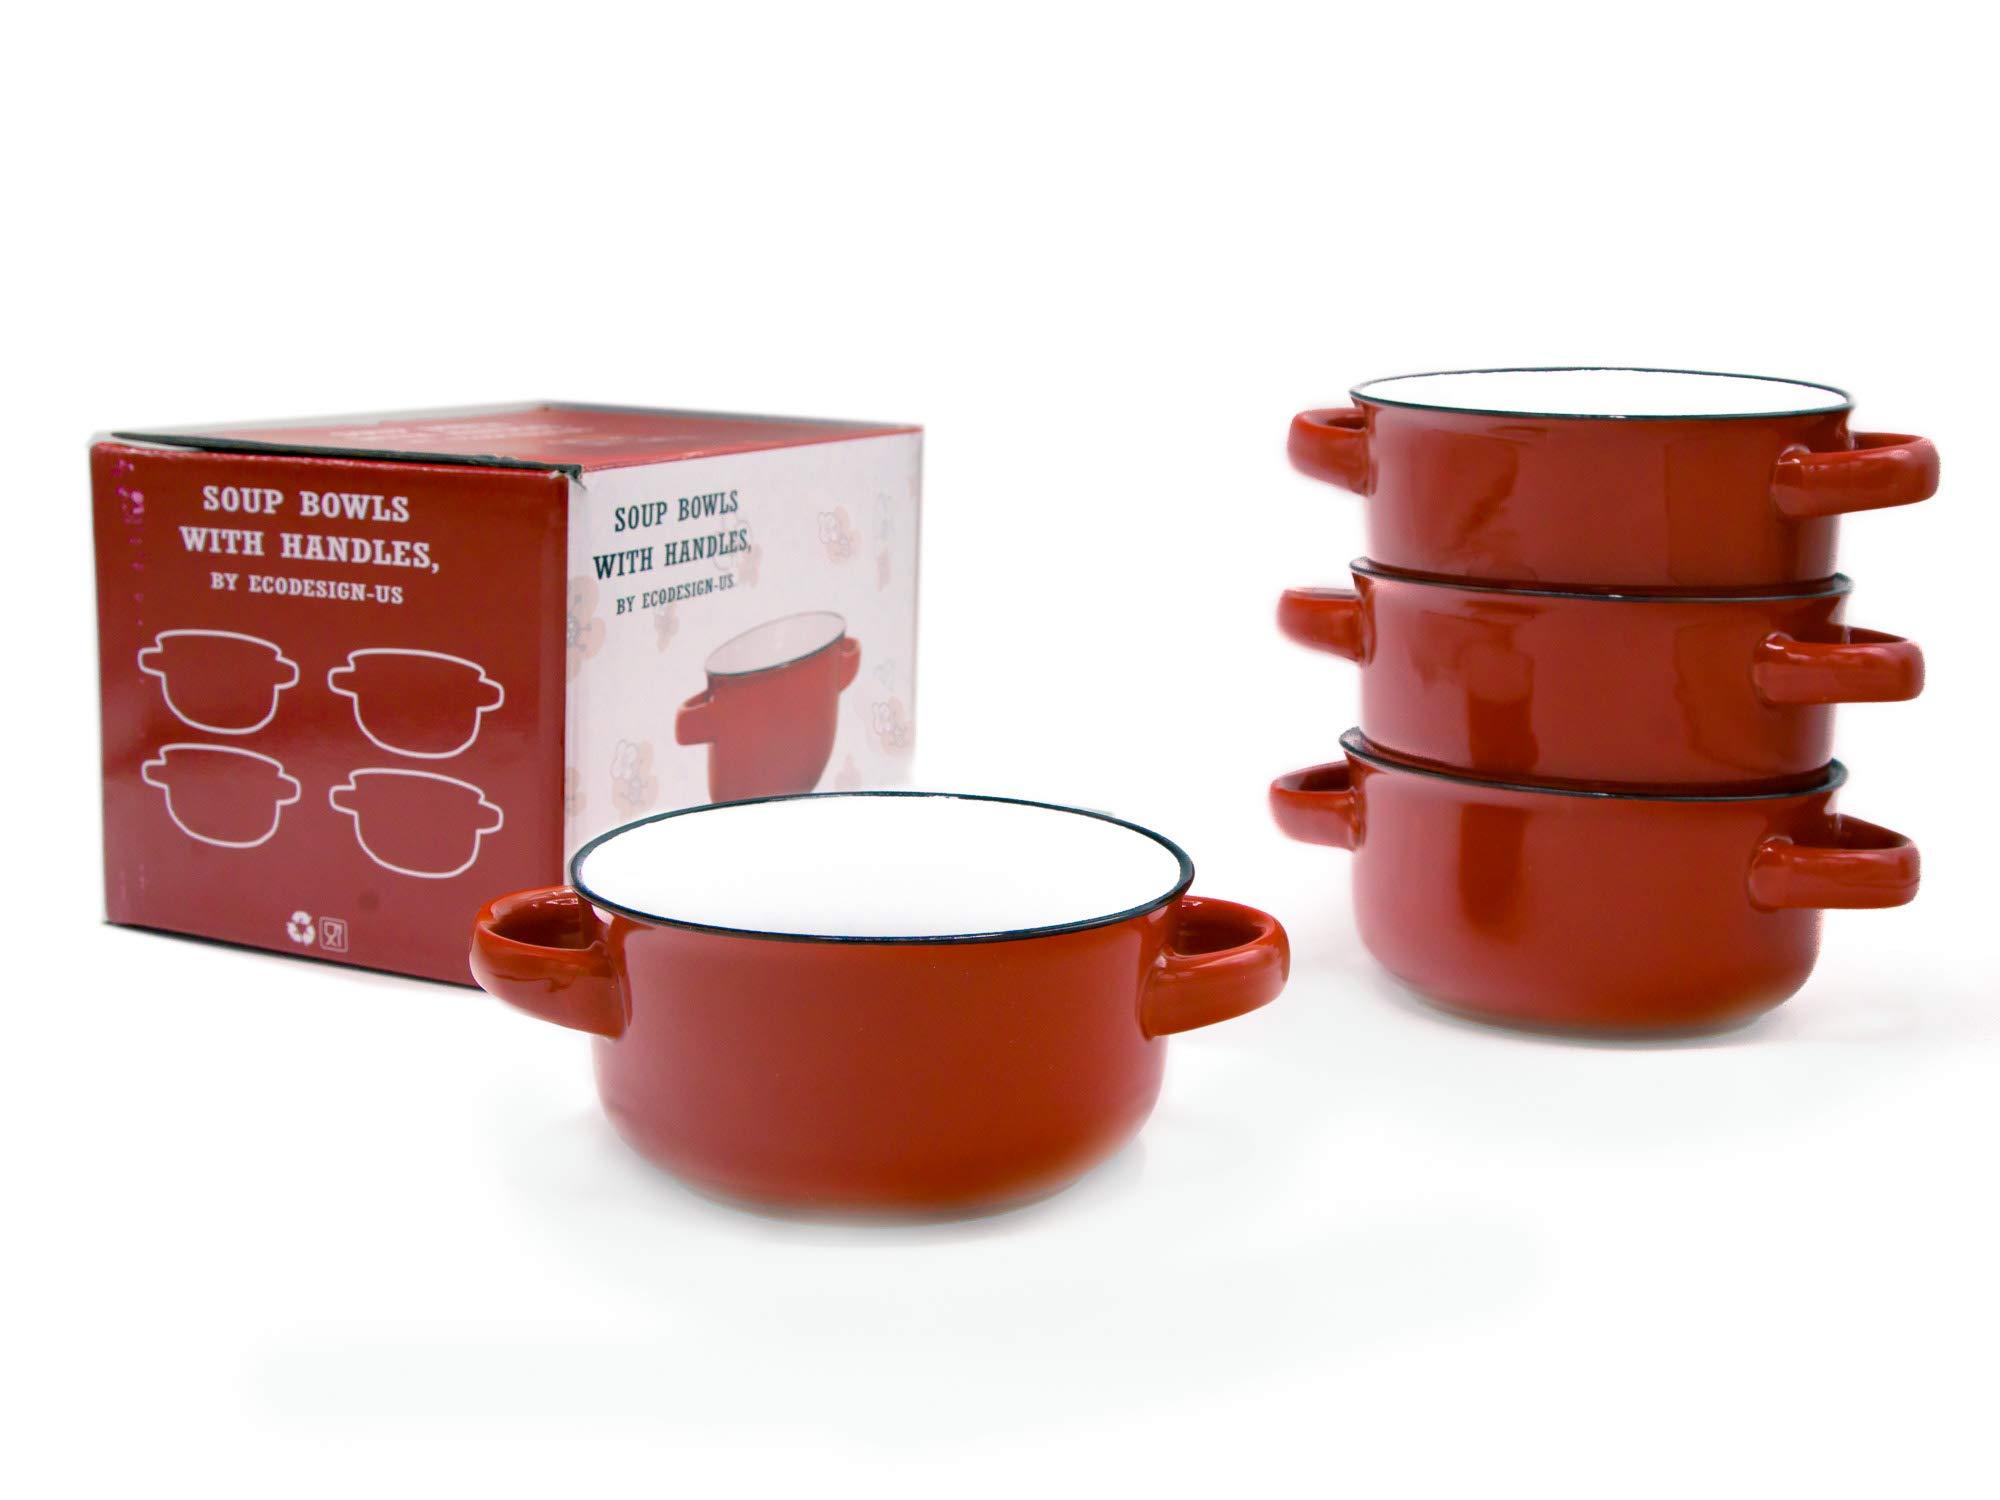 Baking Serving Ceramic Red 16 Oz Soup Bowls with Handles - Set of Four - Stoneware Chowder Bisque Pot Pie Crocks